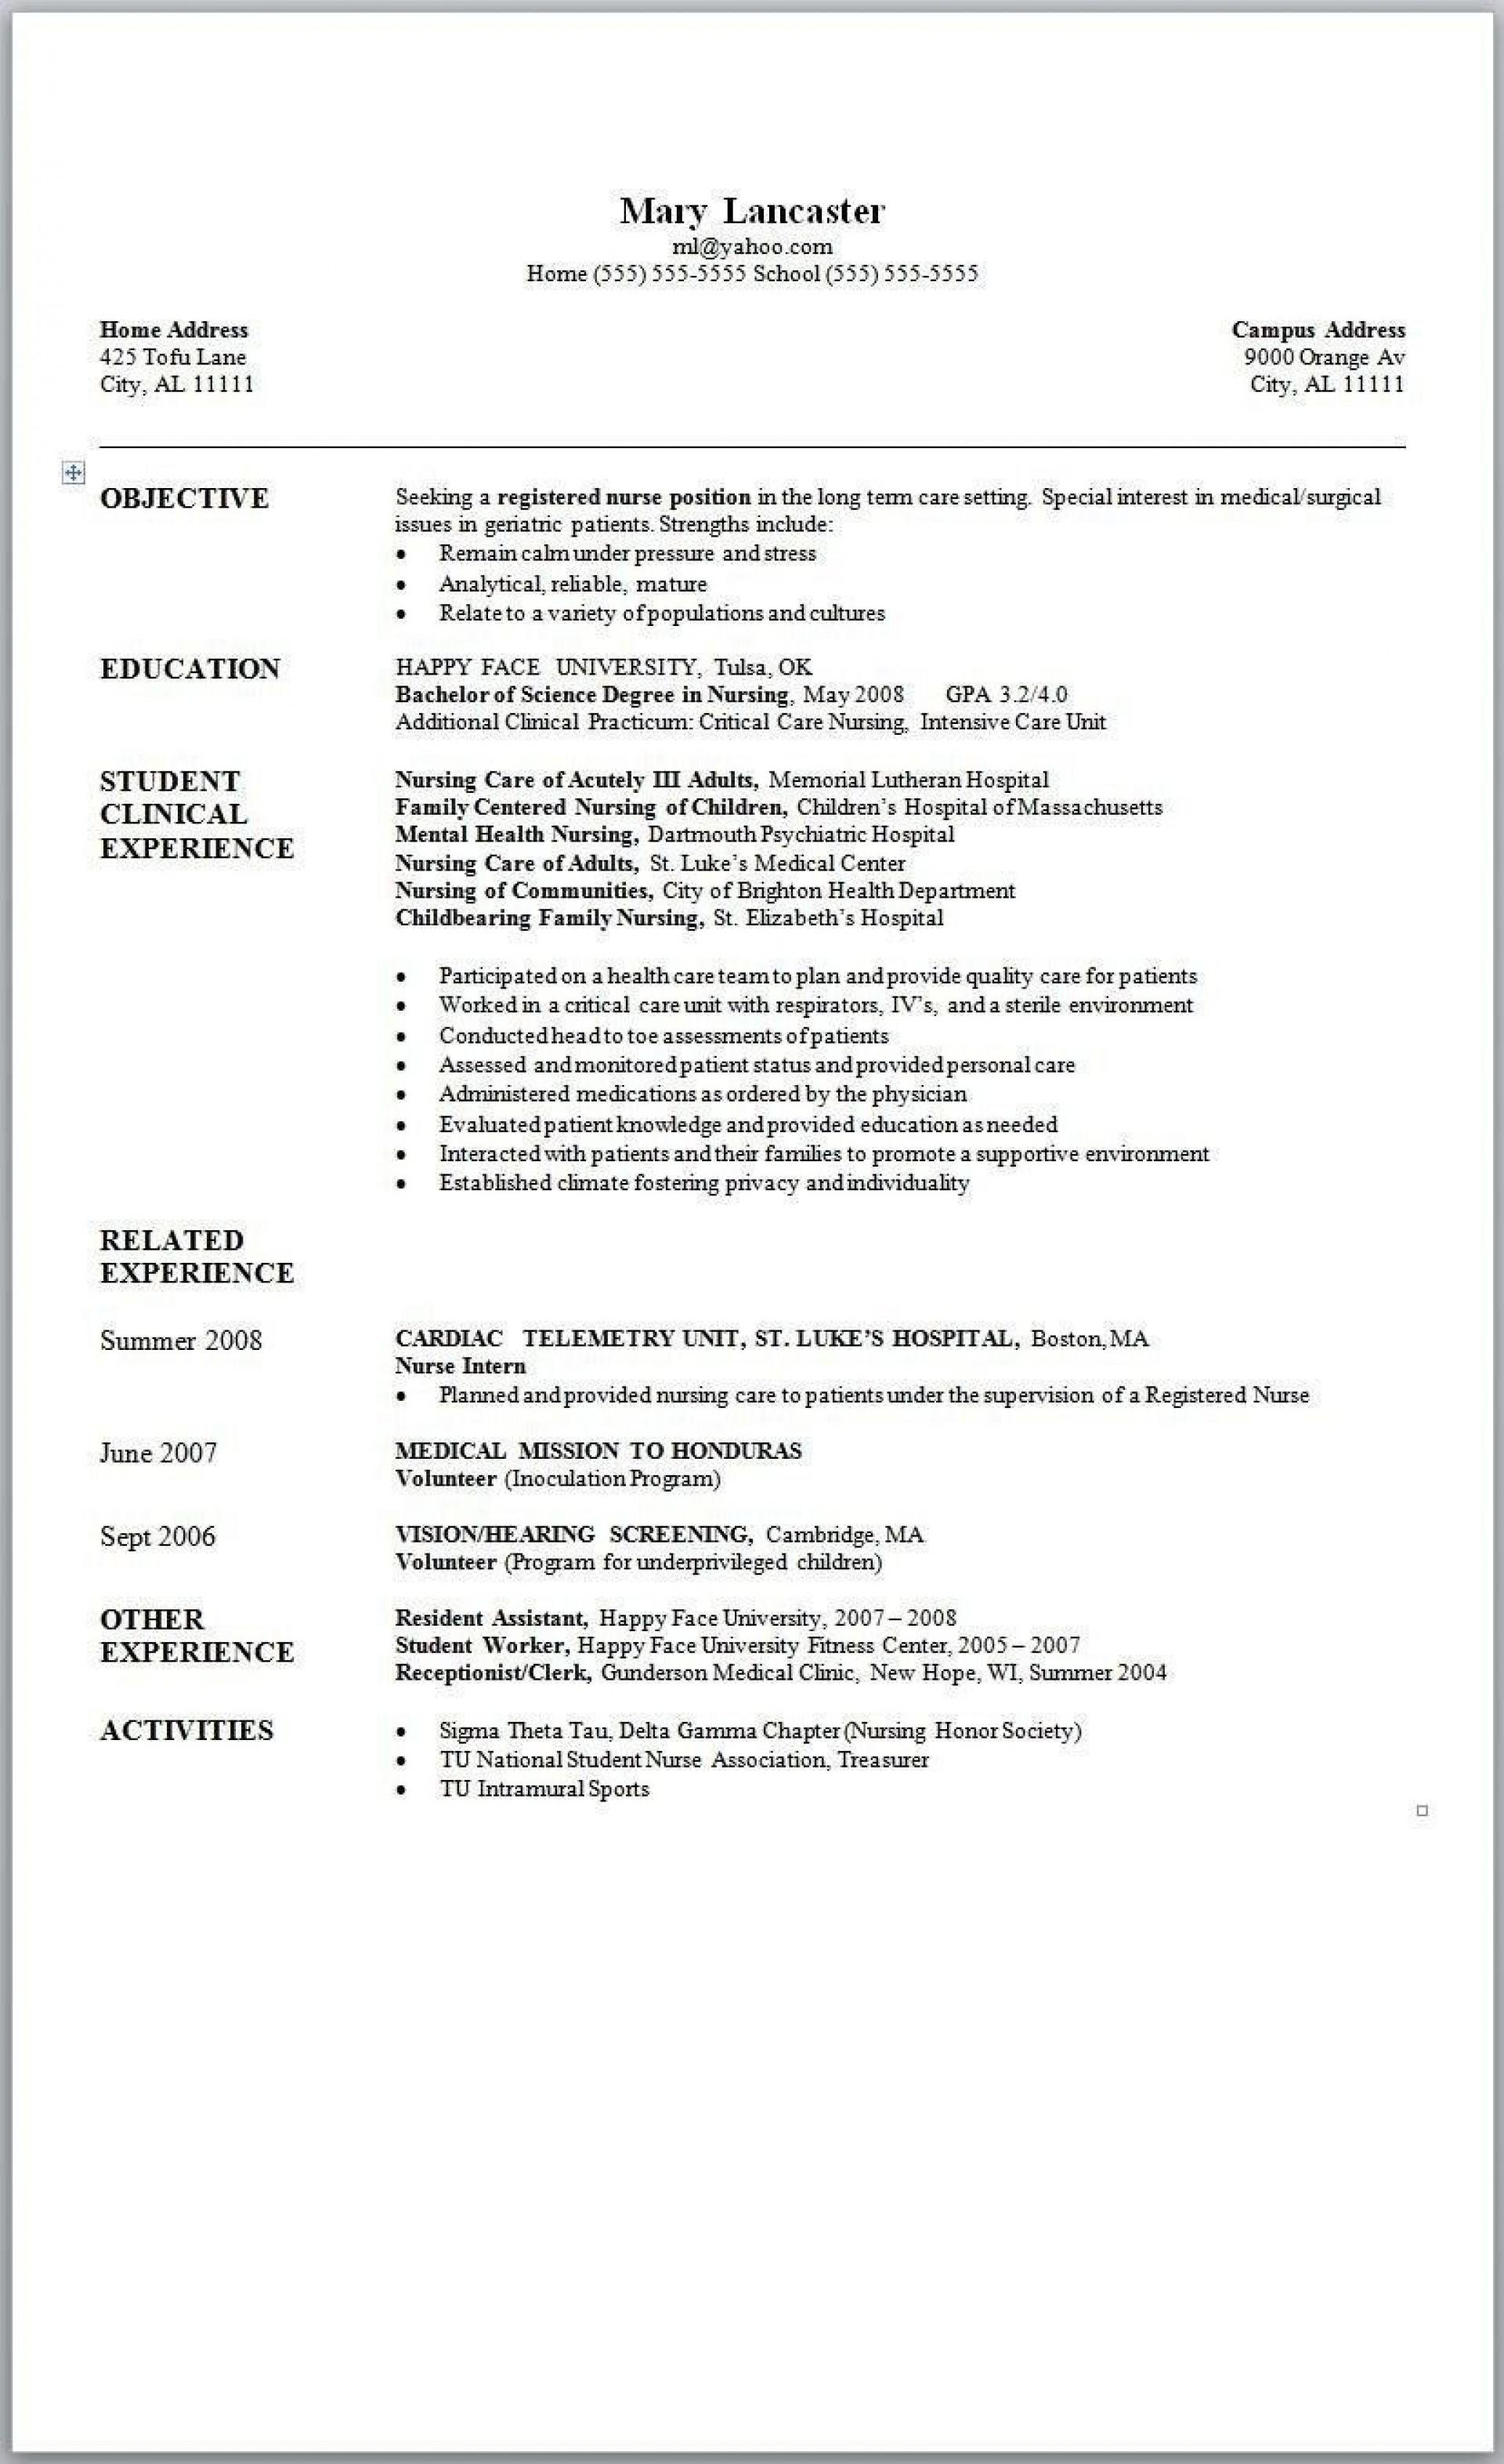 002 Incredible Teacher Resume Template Microsoft Word 2007 High Definition 1920